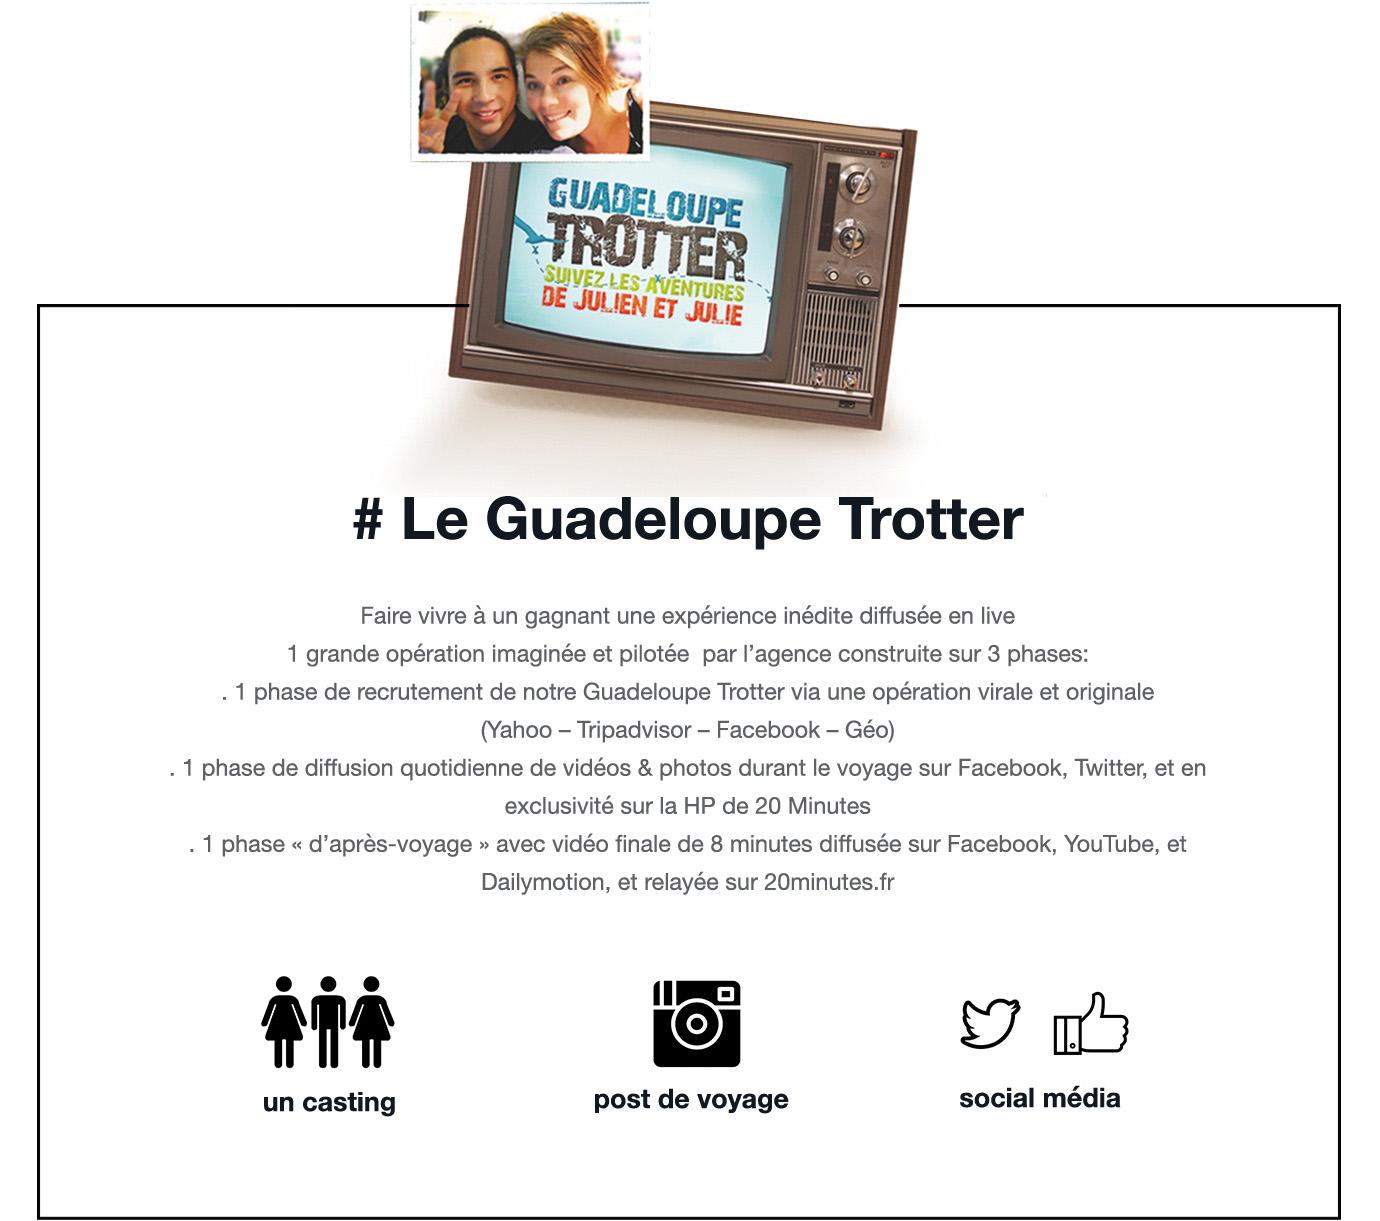 Guadeloupe Trotter Notchup